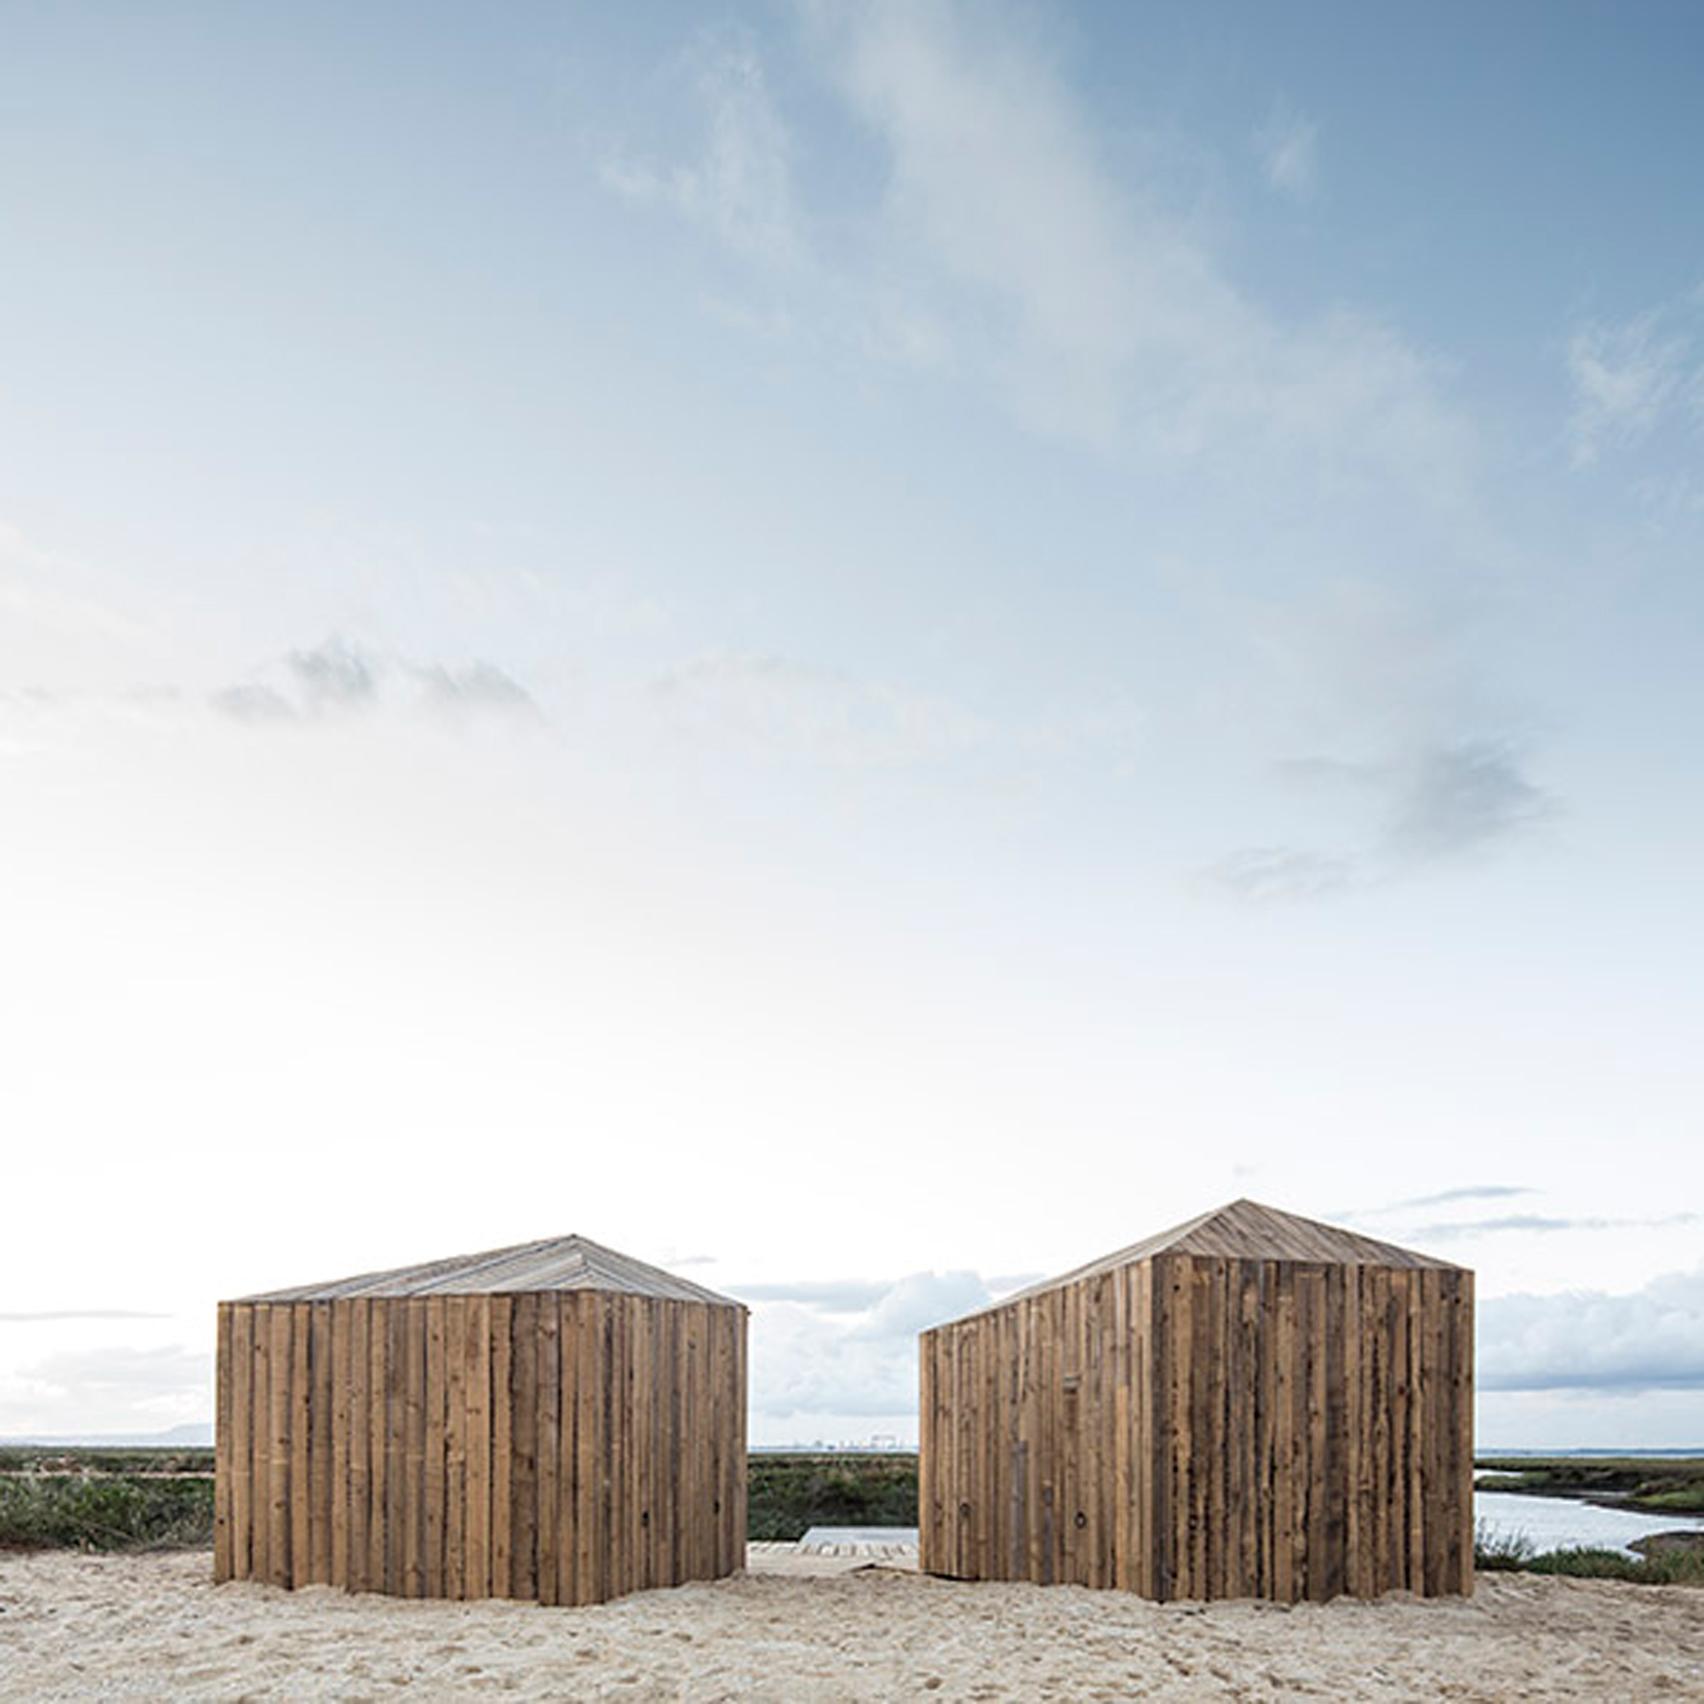 cabanas-no-rio-aires-mateus-micro-homes-roundups-architecture_dezeen_sq.jpg